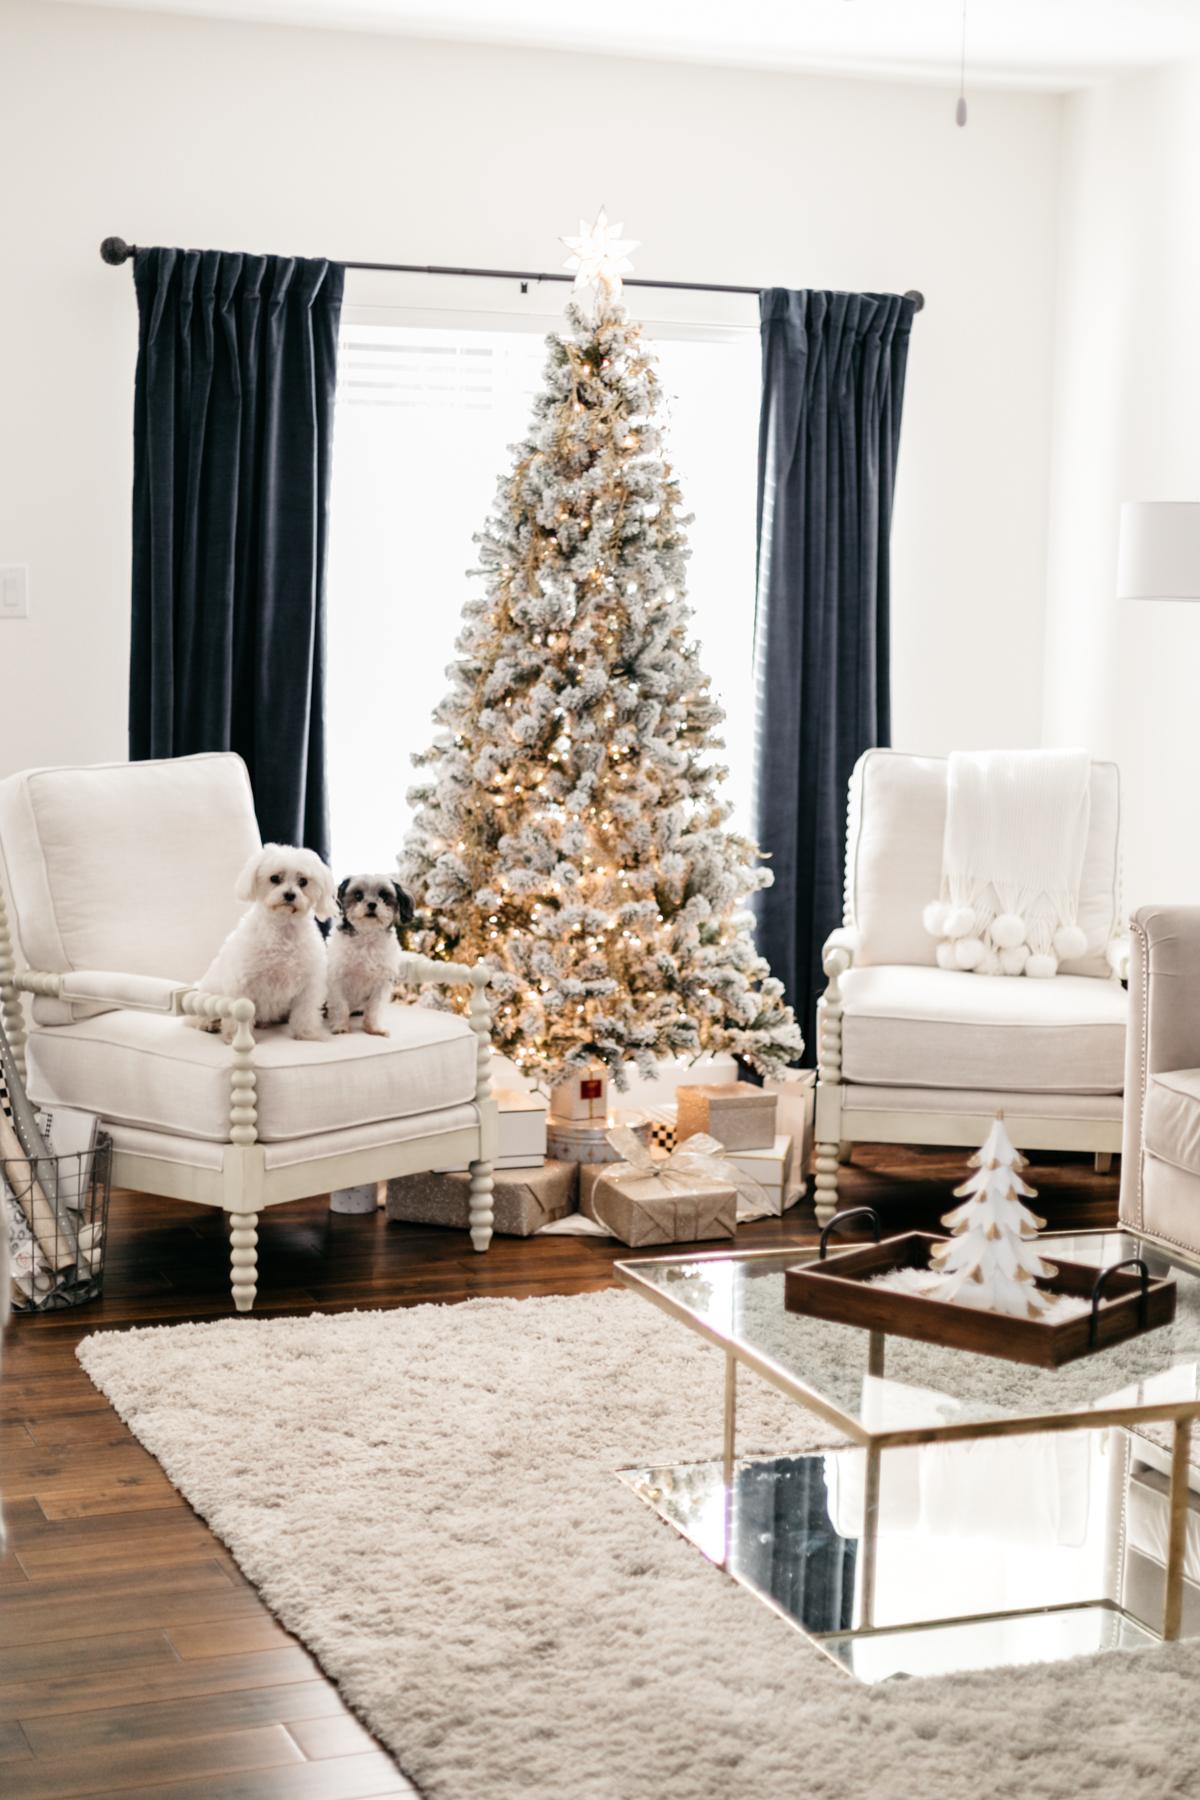 CHRISTMAS HOLIDAY HOME DECOR. U003c. U003e KING OF CHRISTMAS 7 Foot Prince Flock  Artificial Christmas Unlit, Flocked Snow